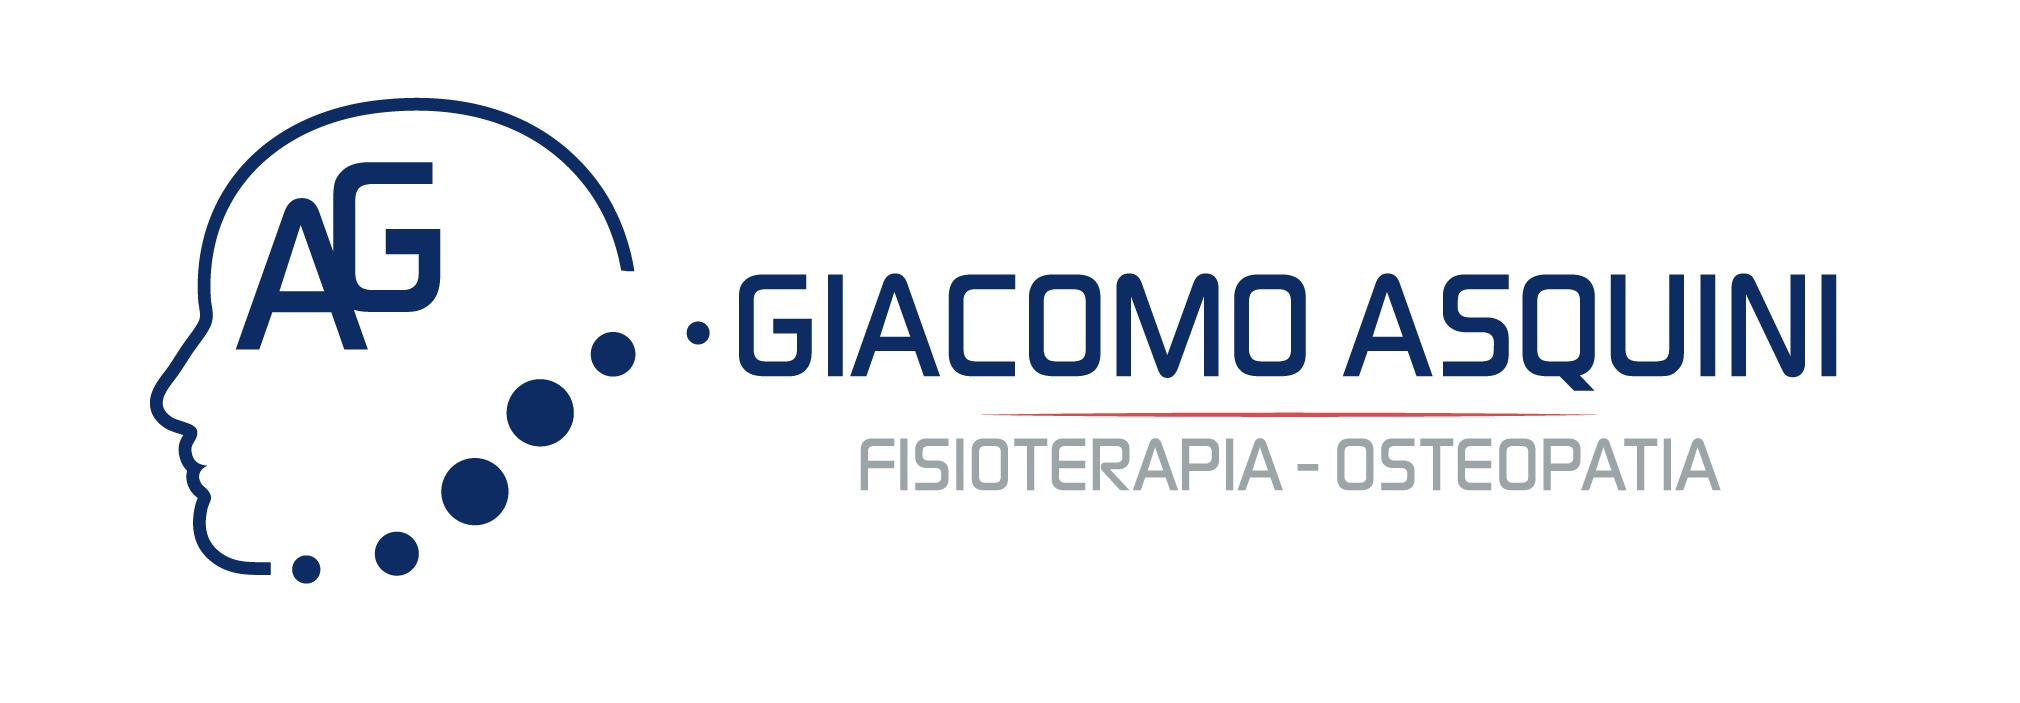 Giacomo Asquini